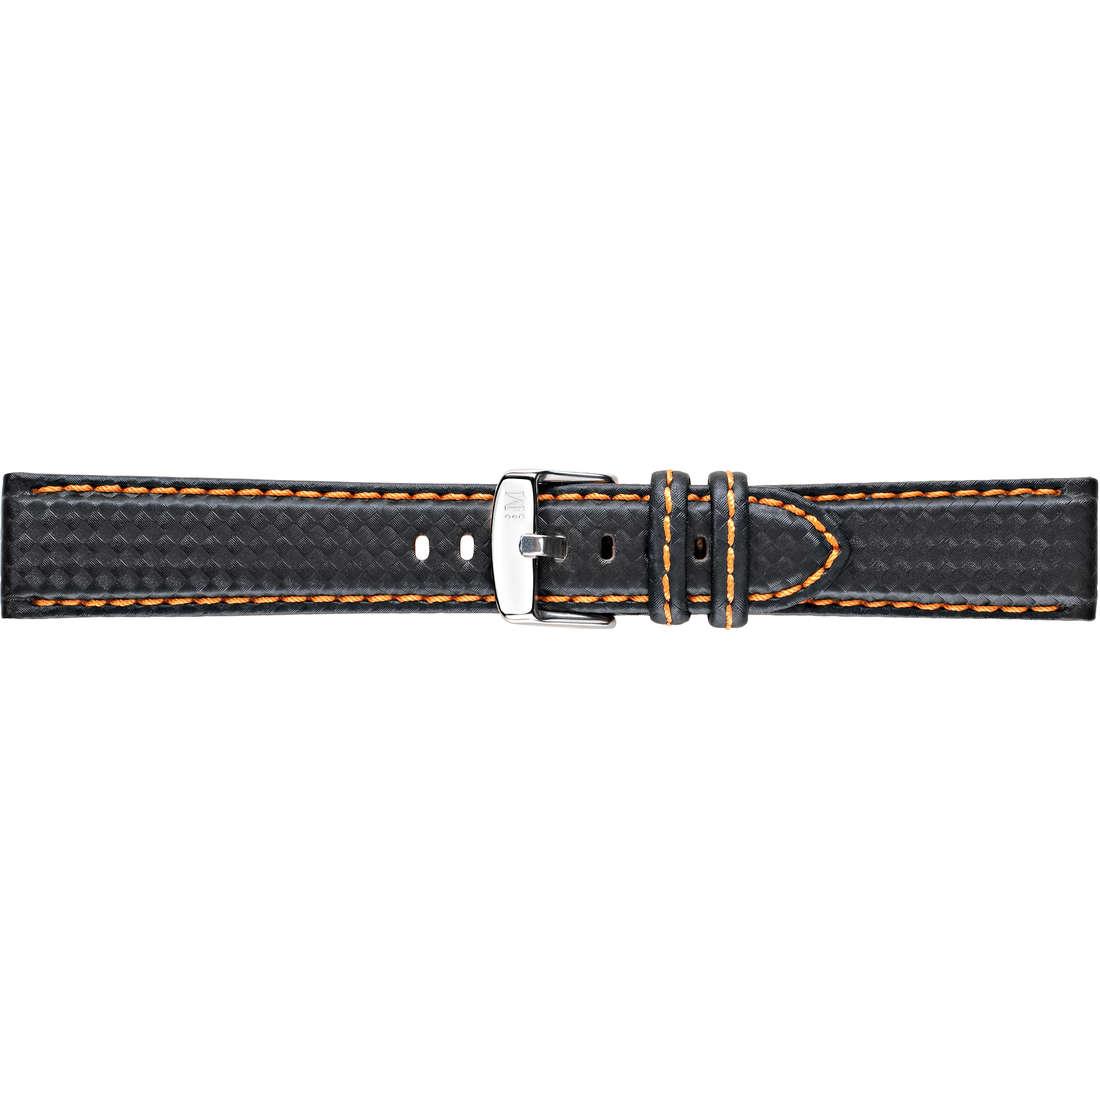 watch watch bands watch straps man Morellato Linea Sport A01U3586977886CR20